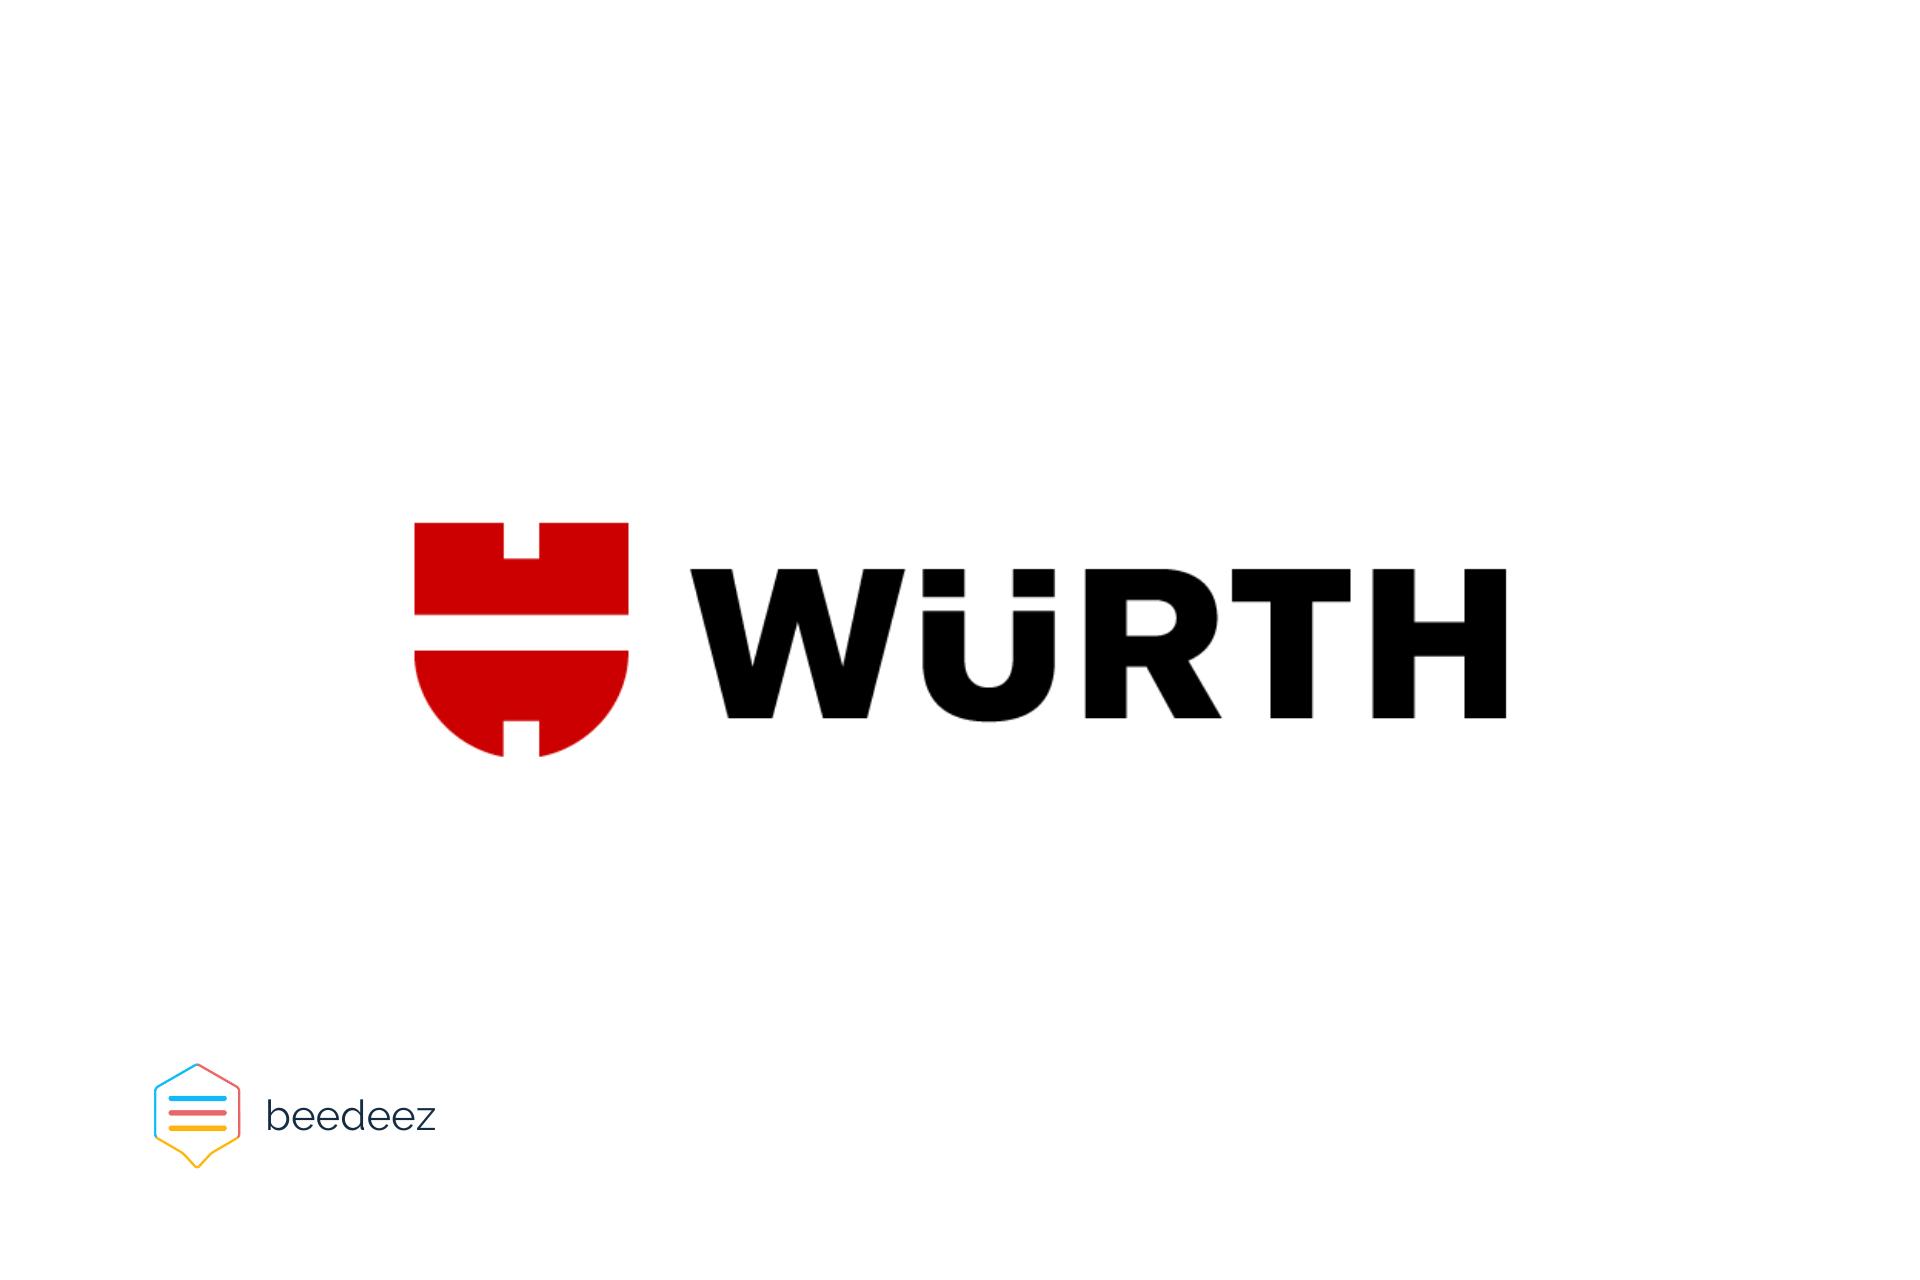 wurth-cas-client